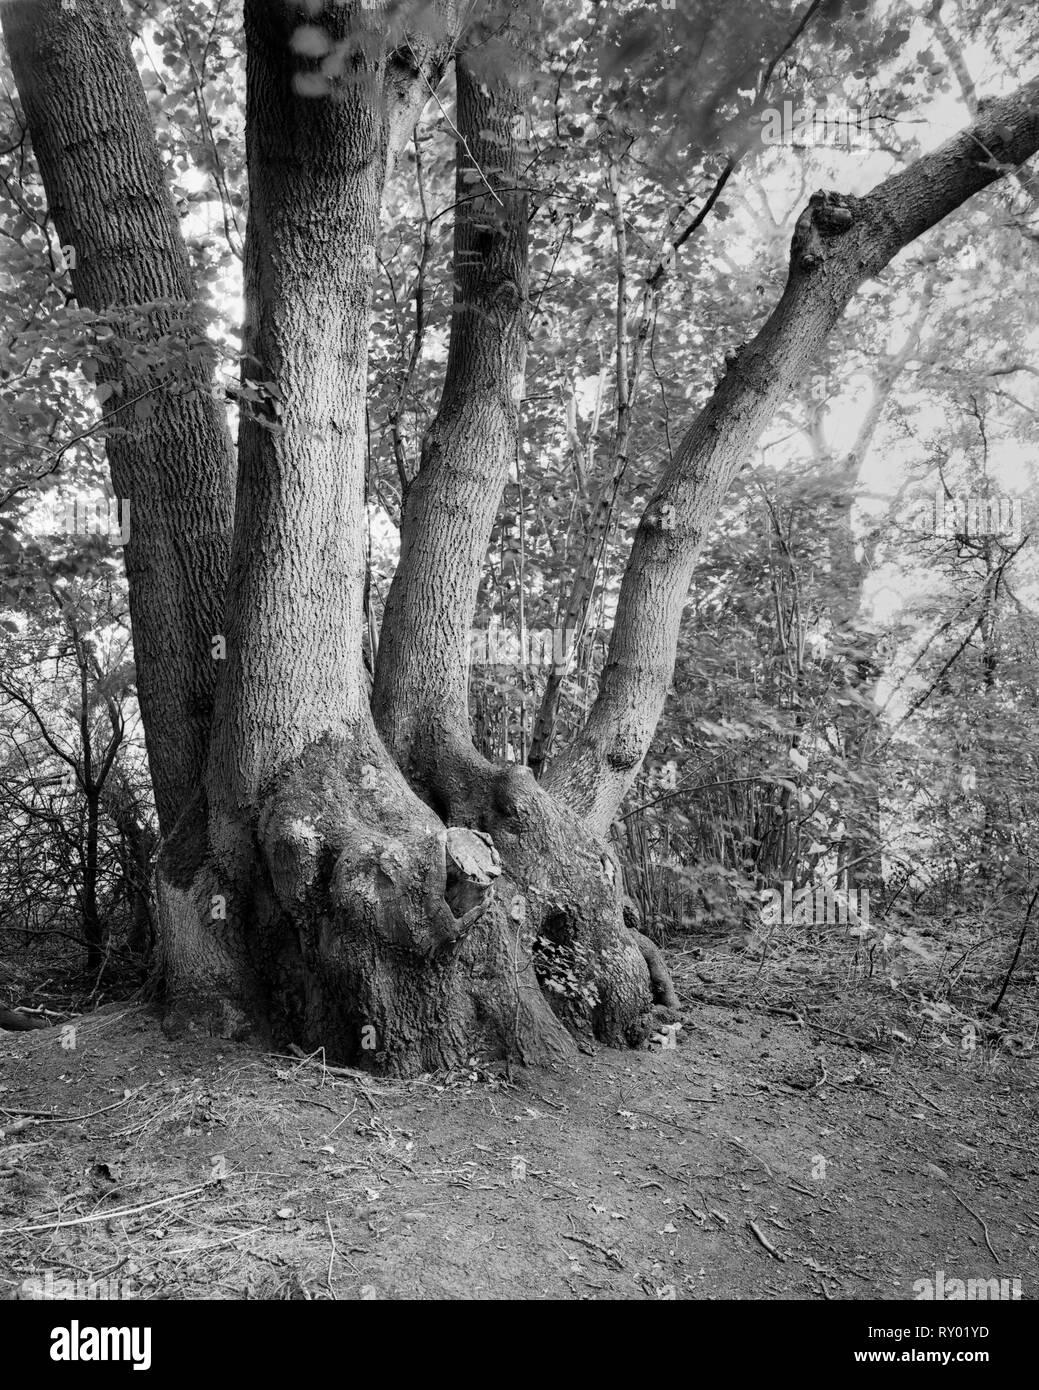 450 year-old coppiced ash tree in Gamlingay Wood Cambnidgeshire England - Stock Image